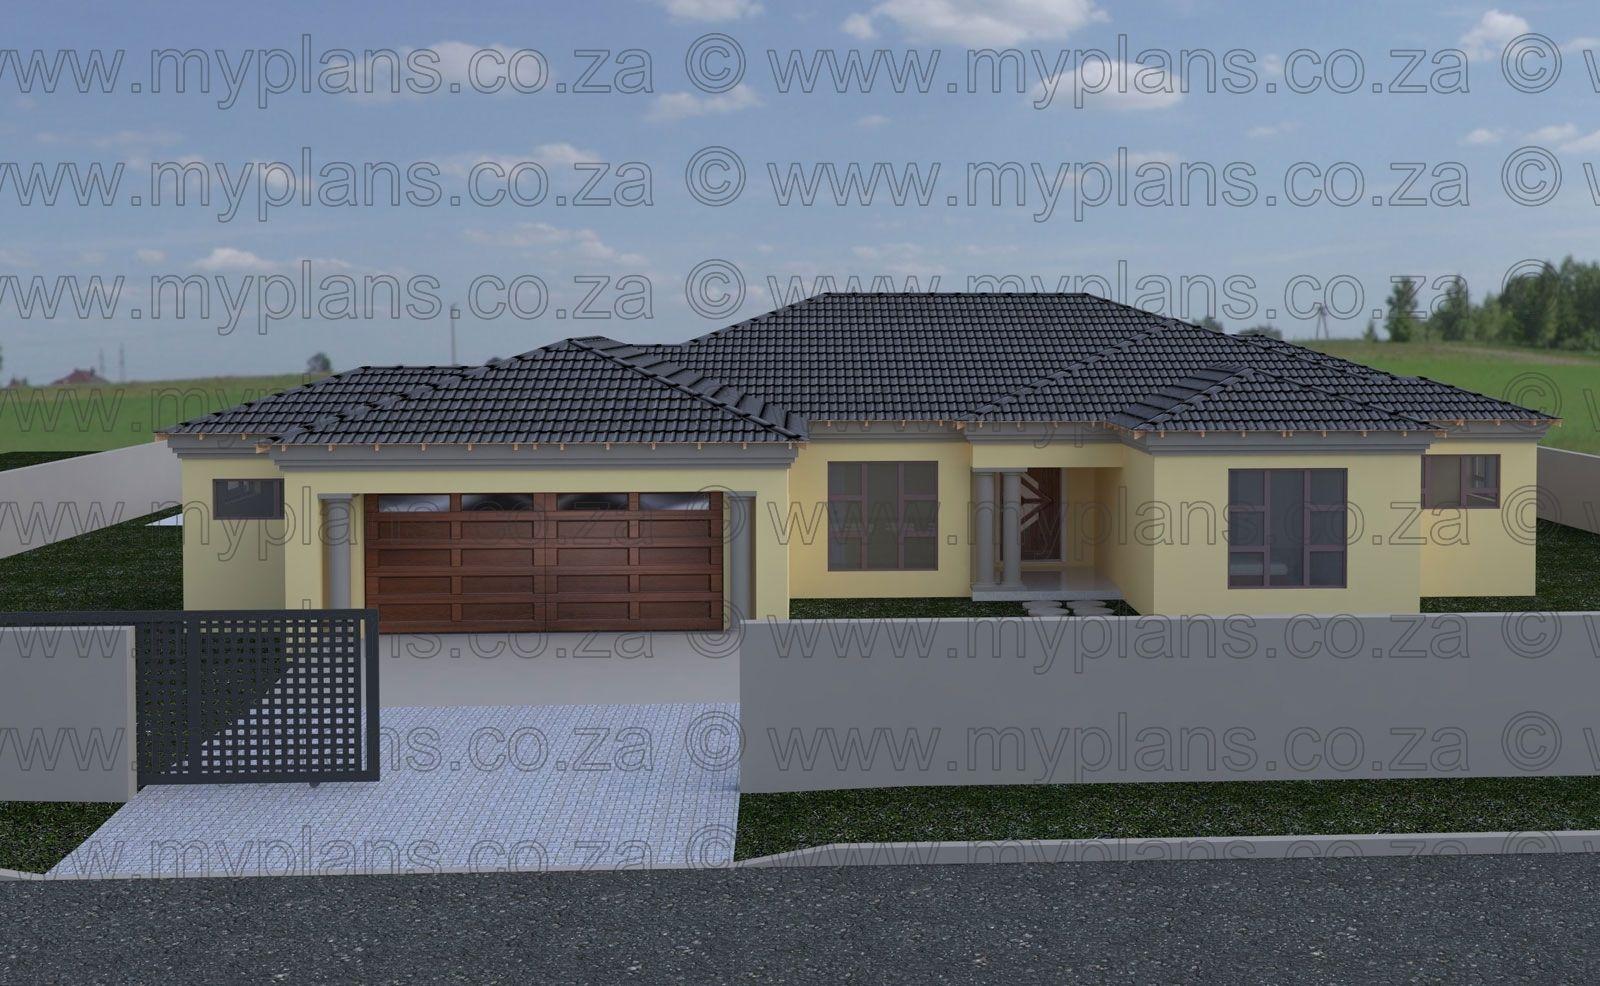 3 Bedroom House Plan Mlb 069s House Plans Tuscan House